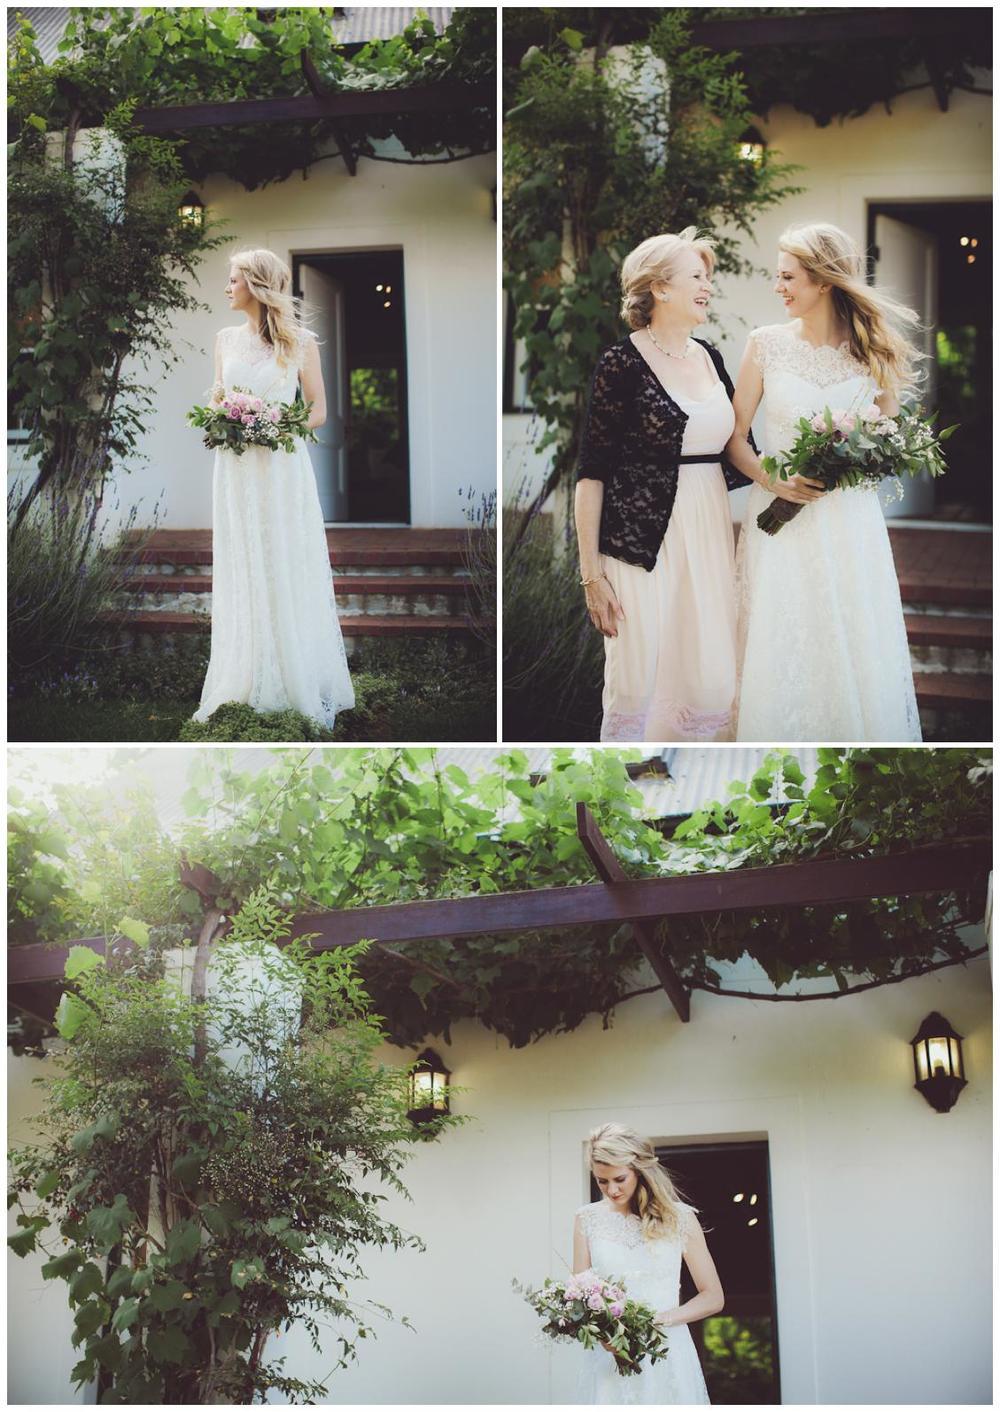 Wessel&Clarissa_FionaClairPhotography-34.jpg